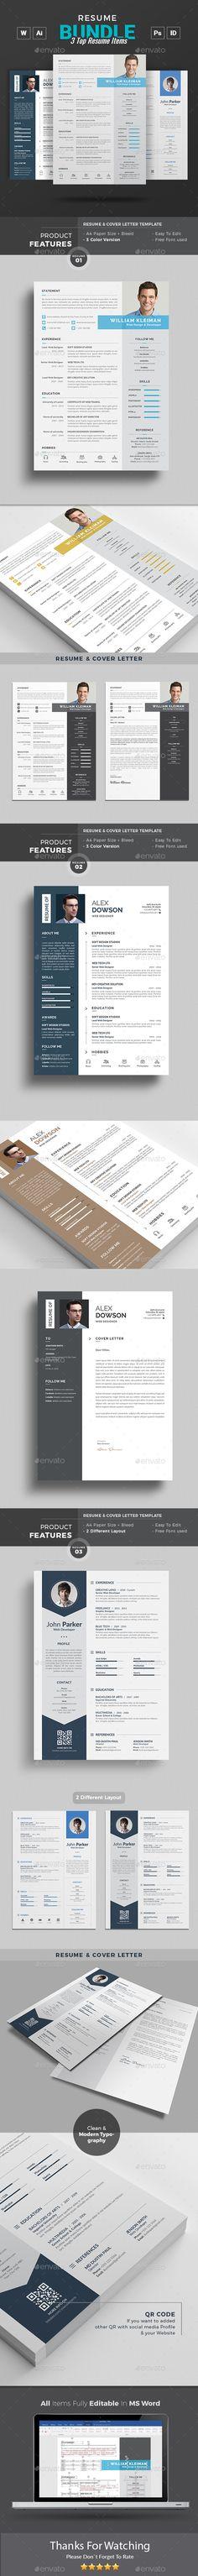 2878 best CV  Resume Design images on Pinterest Resume design